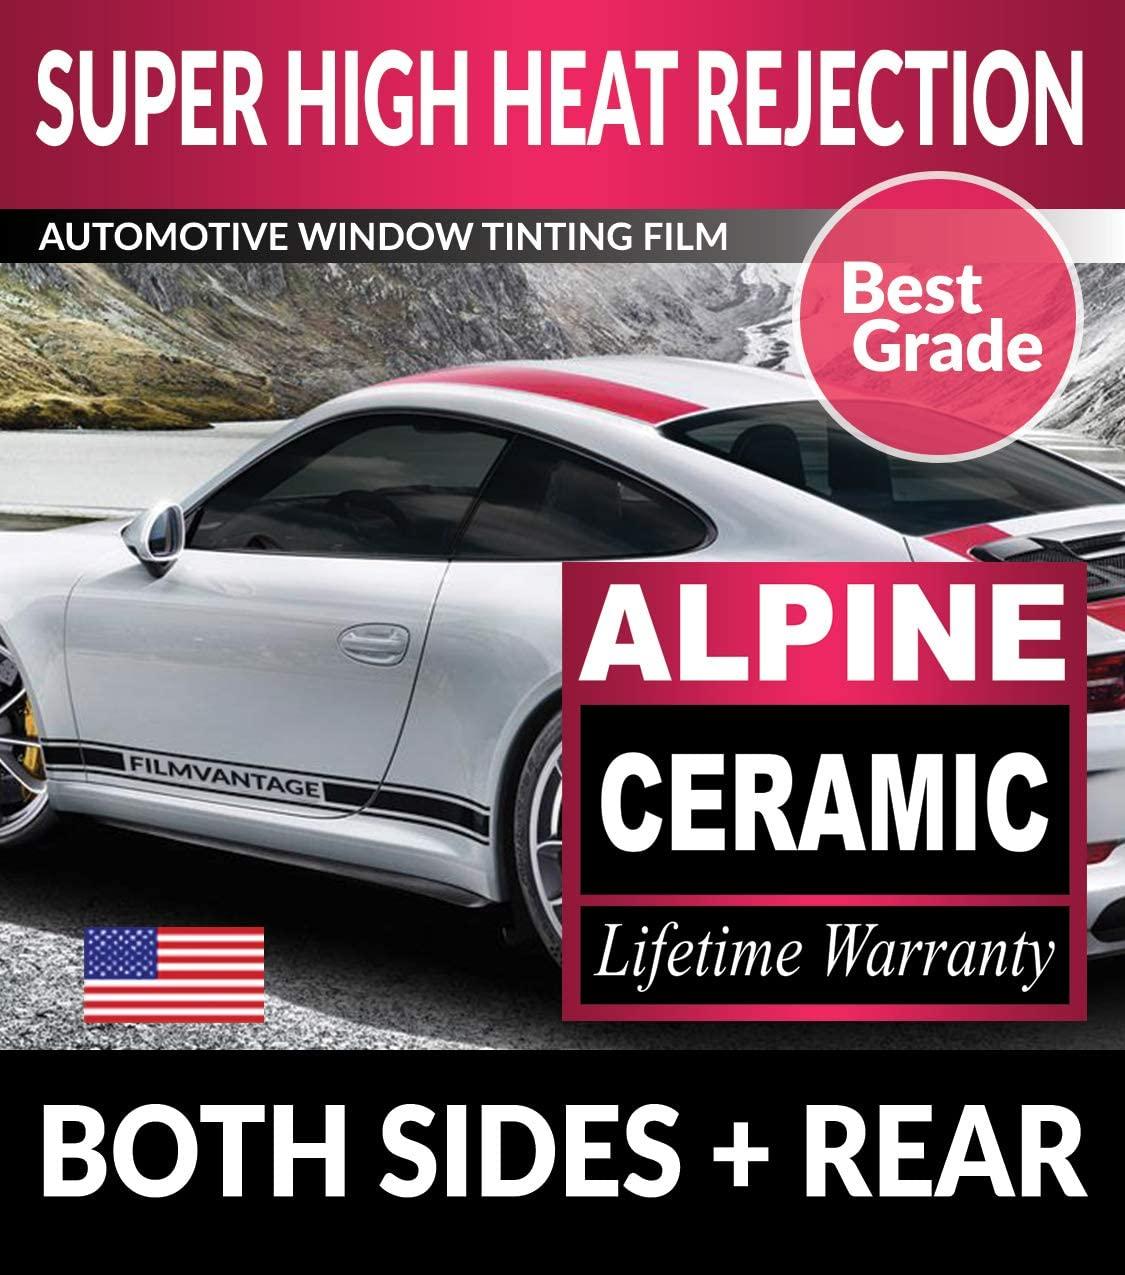 Super High Heat Rejection Alpine Precut Window Tint for Toyota Sienna 1998 1999 2000 2001 2002 2003 - F35R35